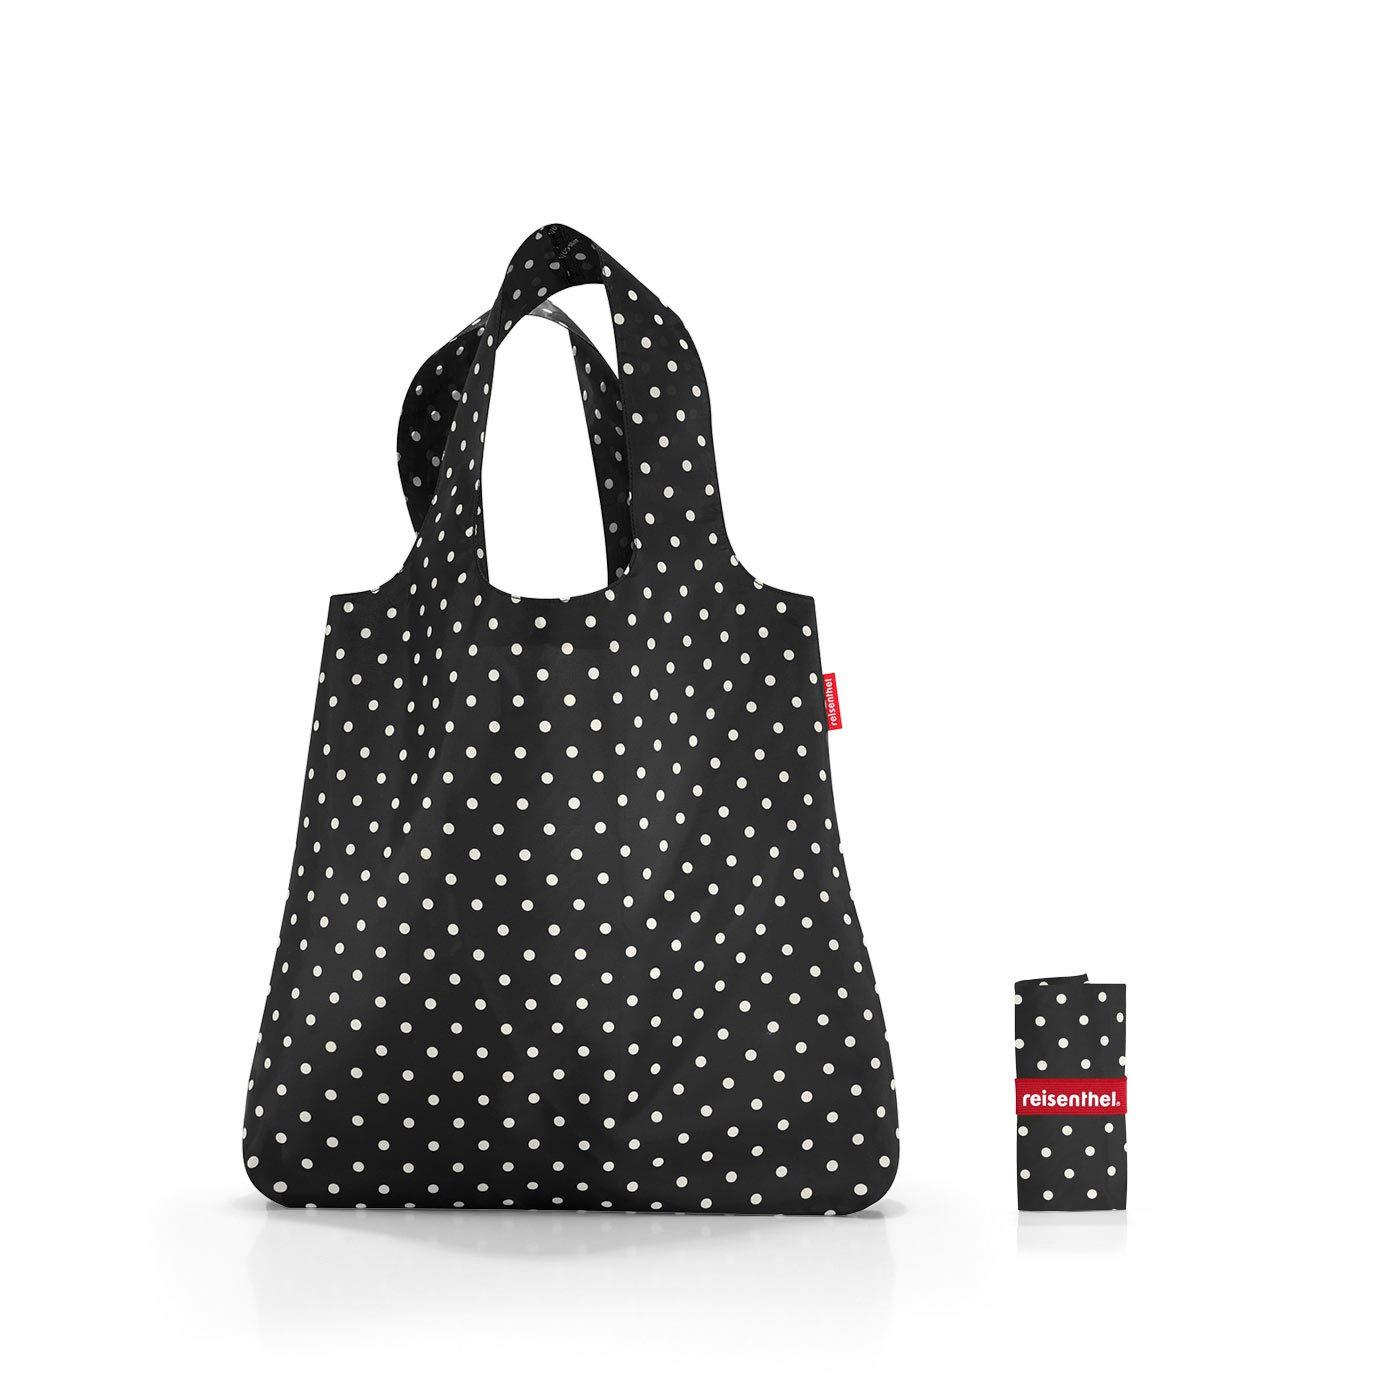 Reisenthel Mini Maxi Shopper Mixed Dots Sac de Sport Grand Format 60 Centimeters 15 Noir (Mixed Dots)